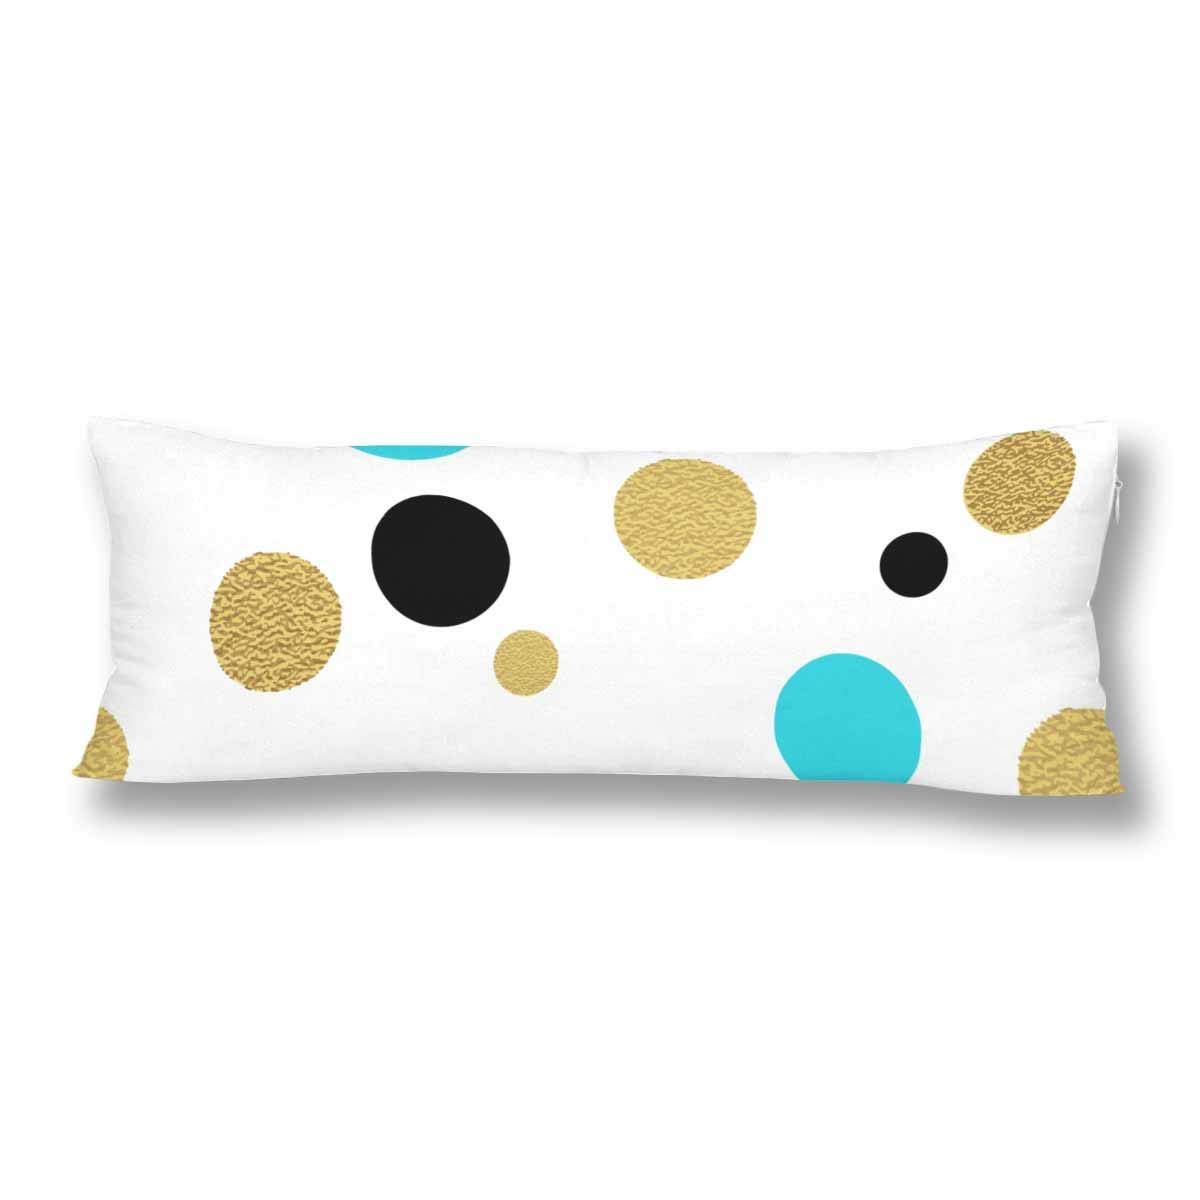 GCKG Gold Glitter Polka Dot Pillow Covers Pillowcase Zipper 20x60 inches, Classic Dotted Body Pillow Case Protector - image 2 de 2